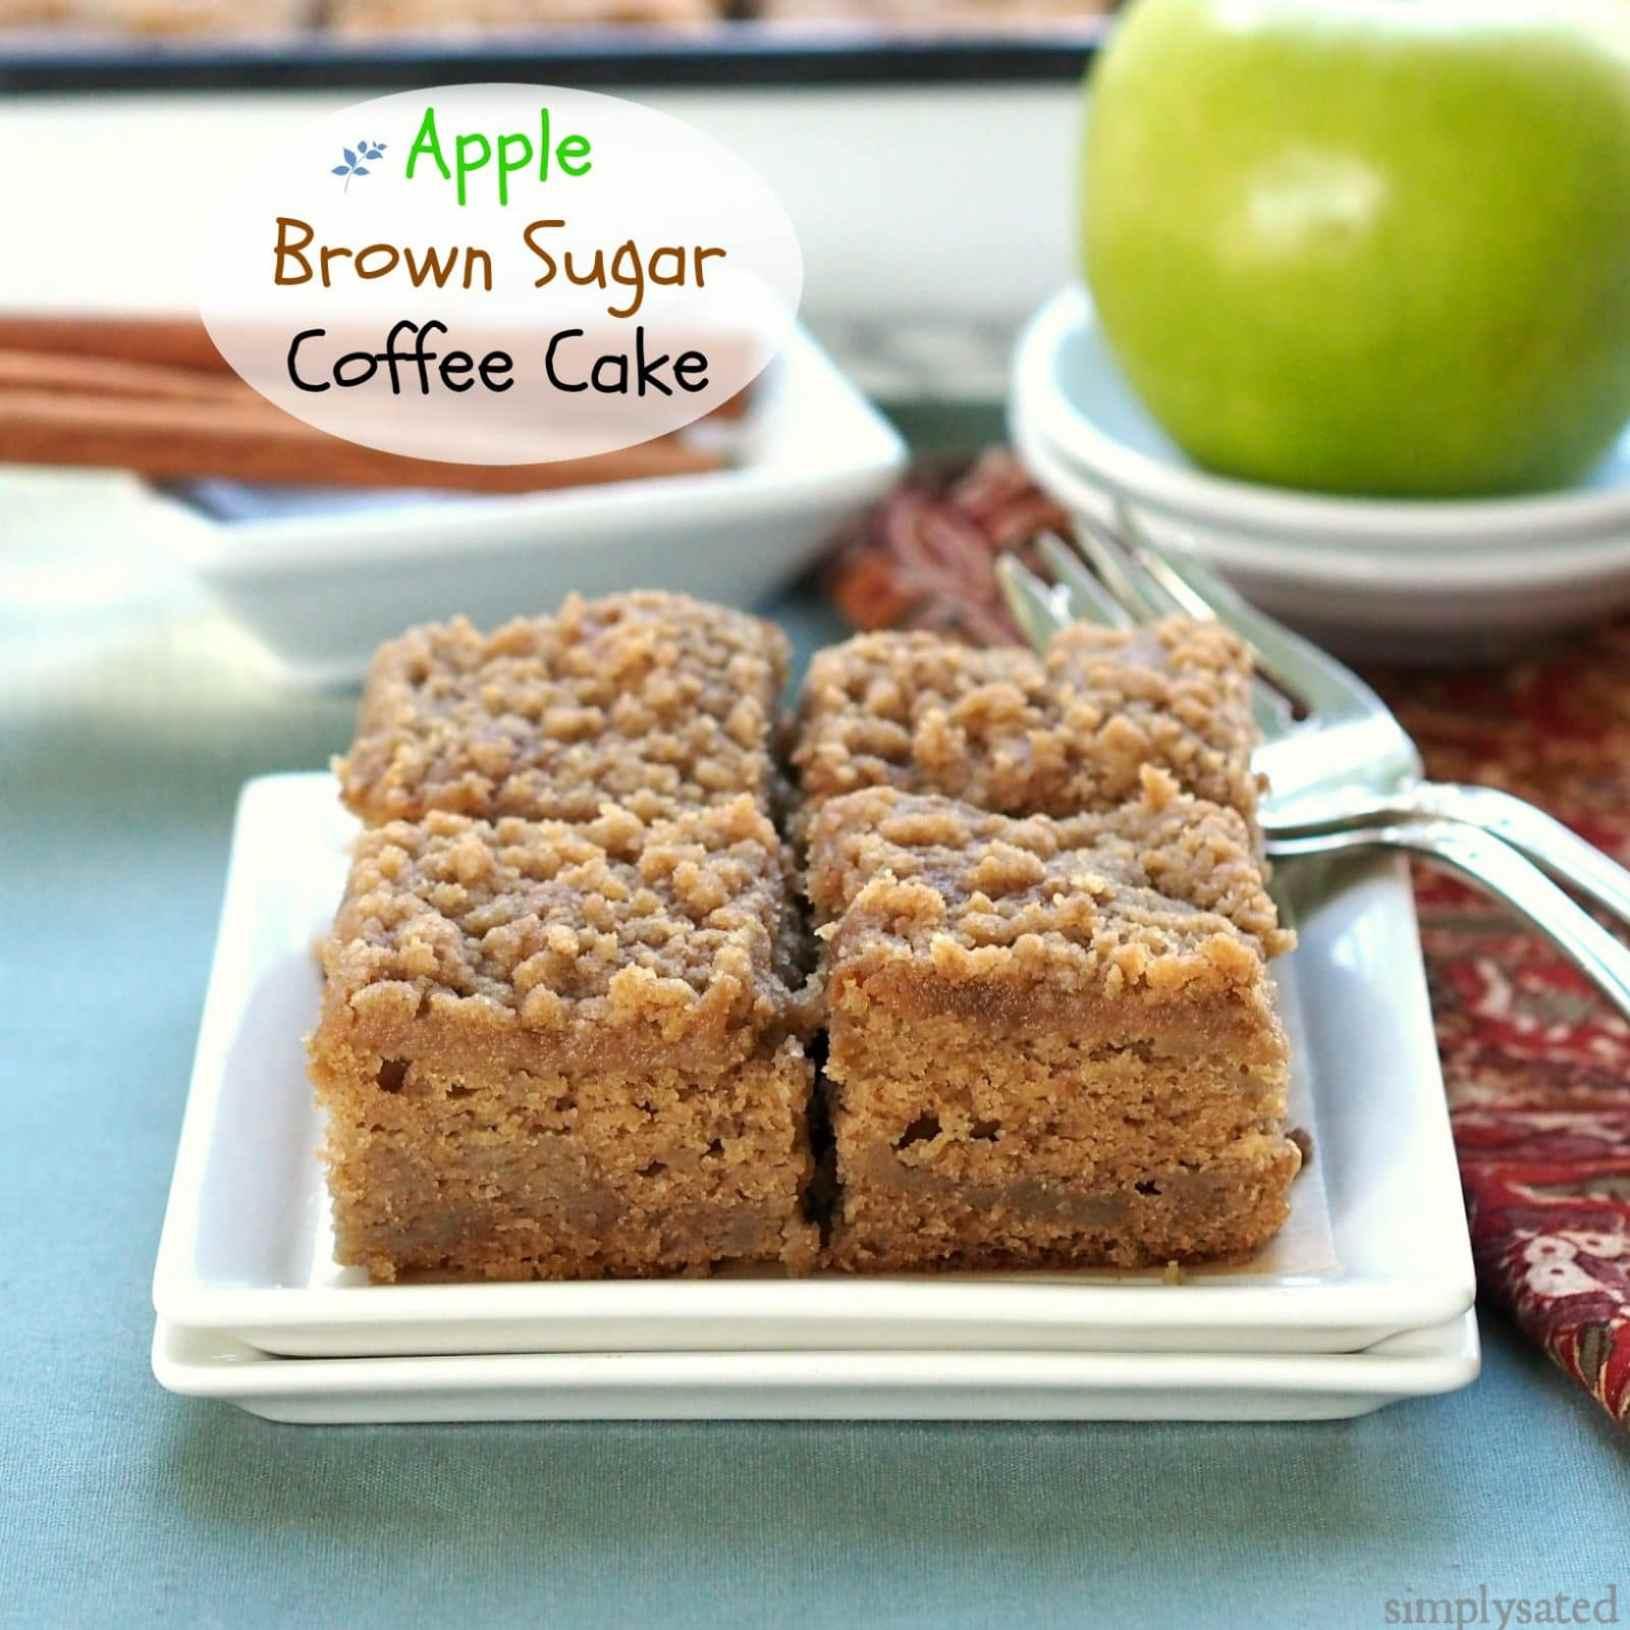 Apple Brown Sugar Coffee Cake